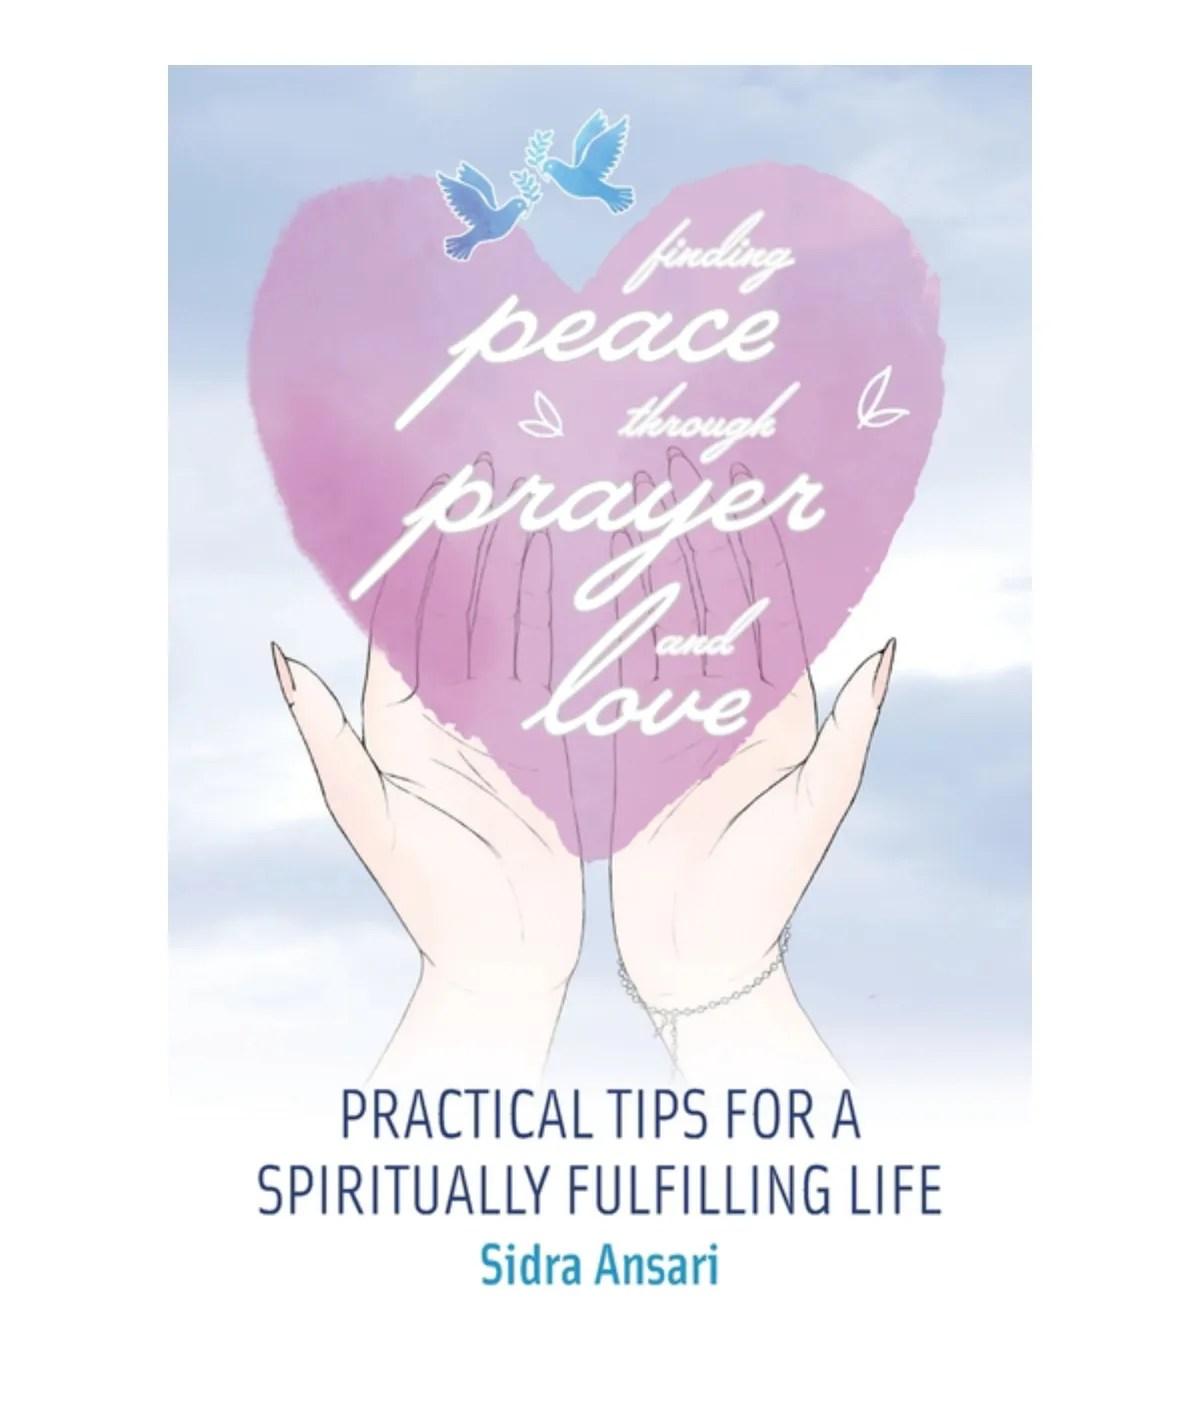 Finding Peace Through Prayer and Love: Practical Tips for a Spiritually Fulfilling Life: Ansari, Sidra